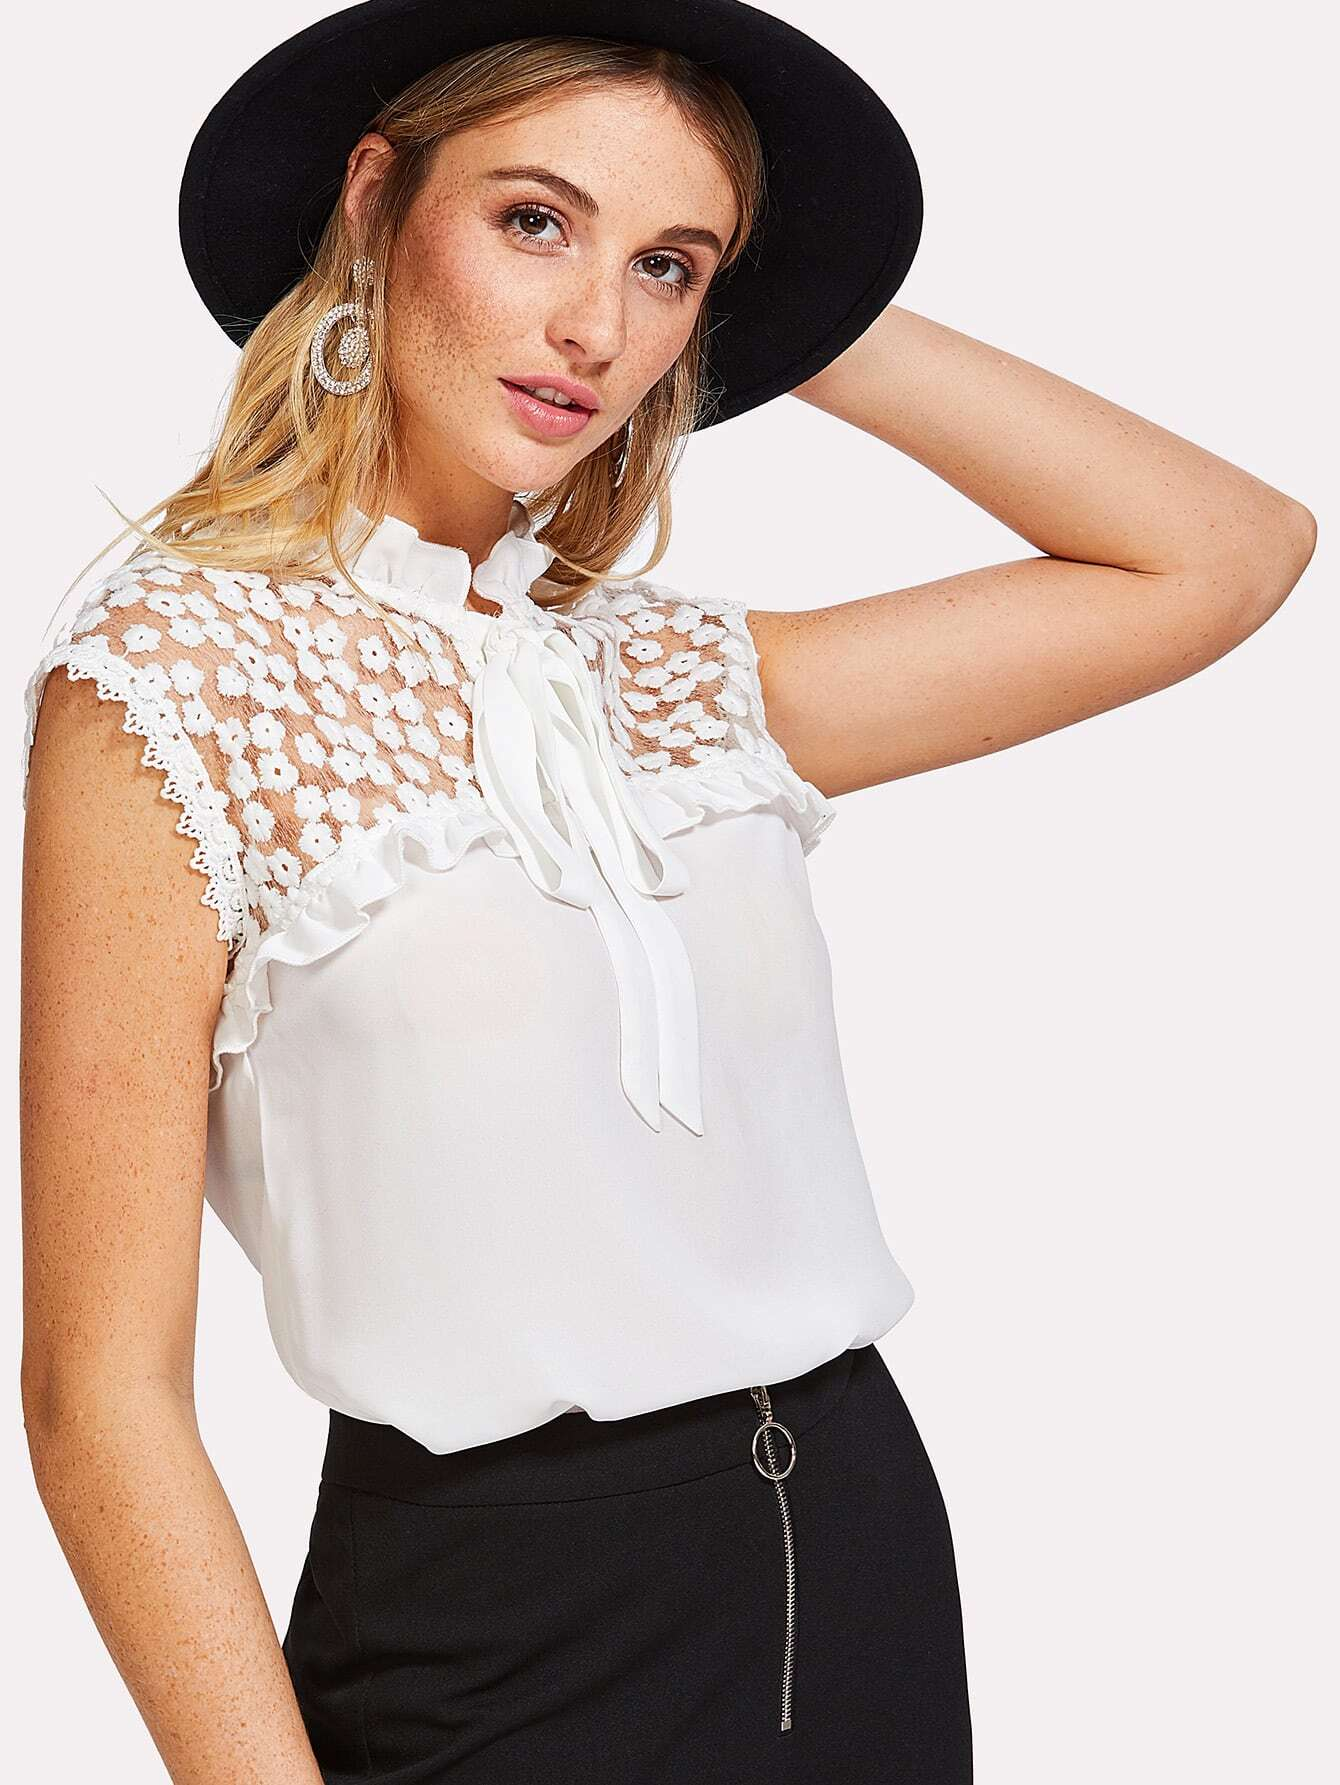 Tie Neck Embroidered Mesh Yoke Sleeveless Top blouse171225702